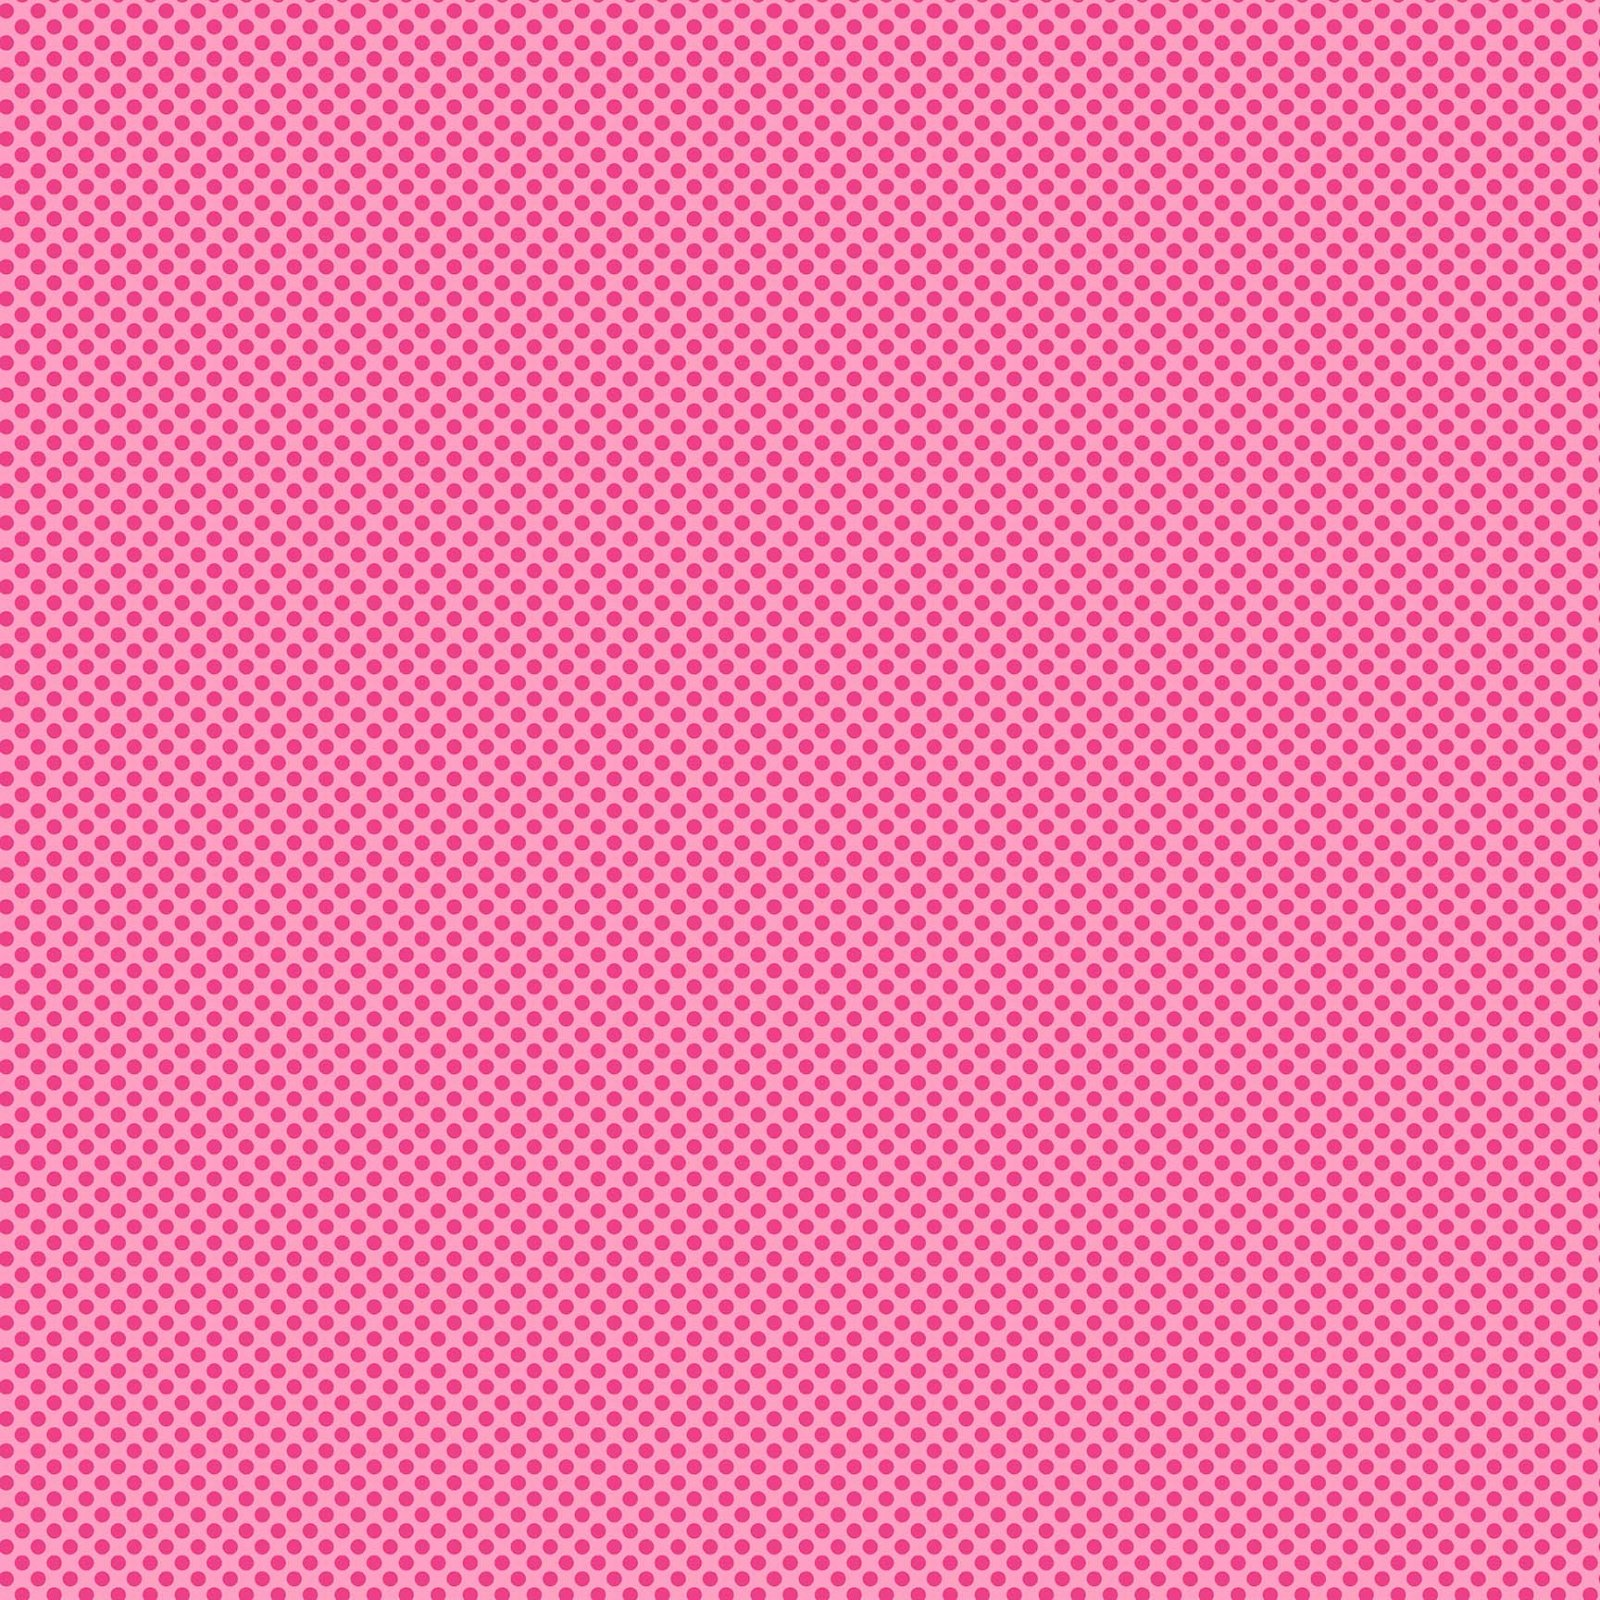 Urban Elementz Pink Dots